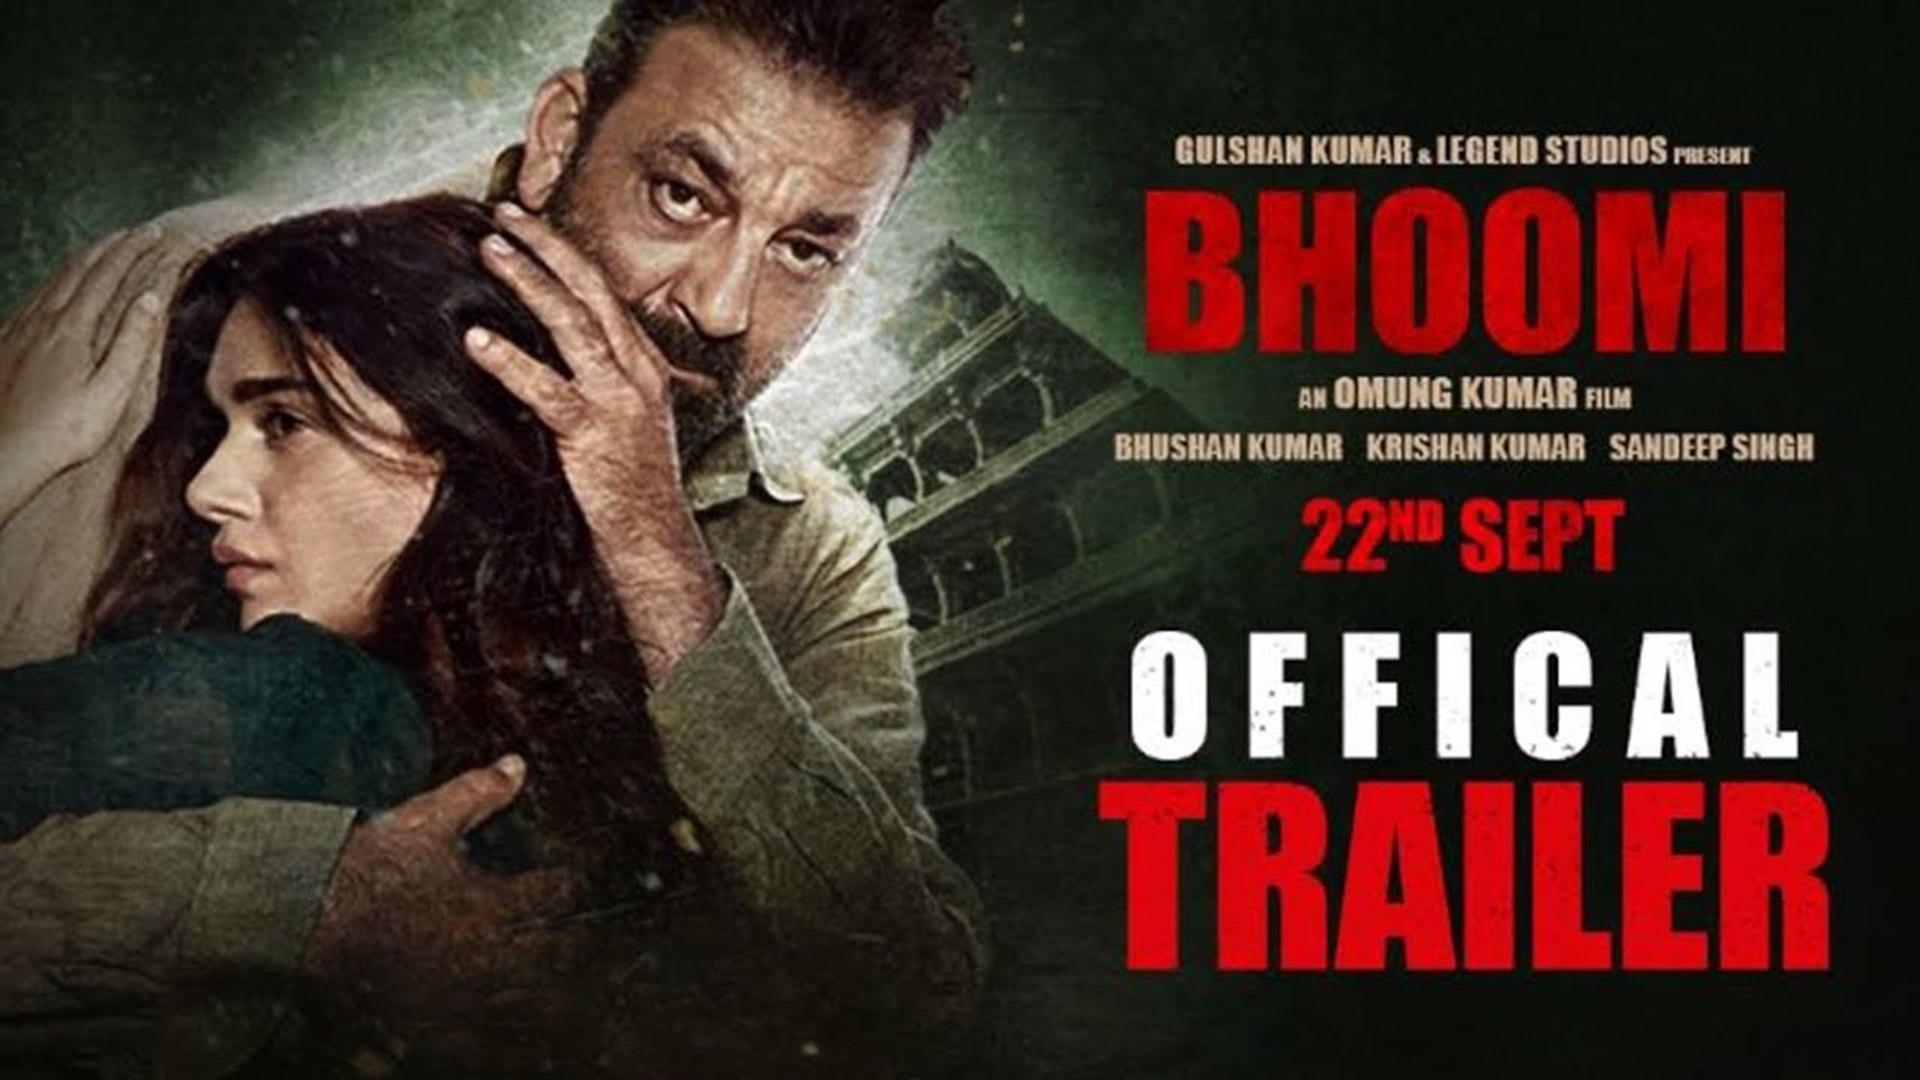 Bhoomi Official Trailer | Sanjay Dutt | Aditi Rao Hydari | Releasing 22 September | Bollywood Classi